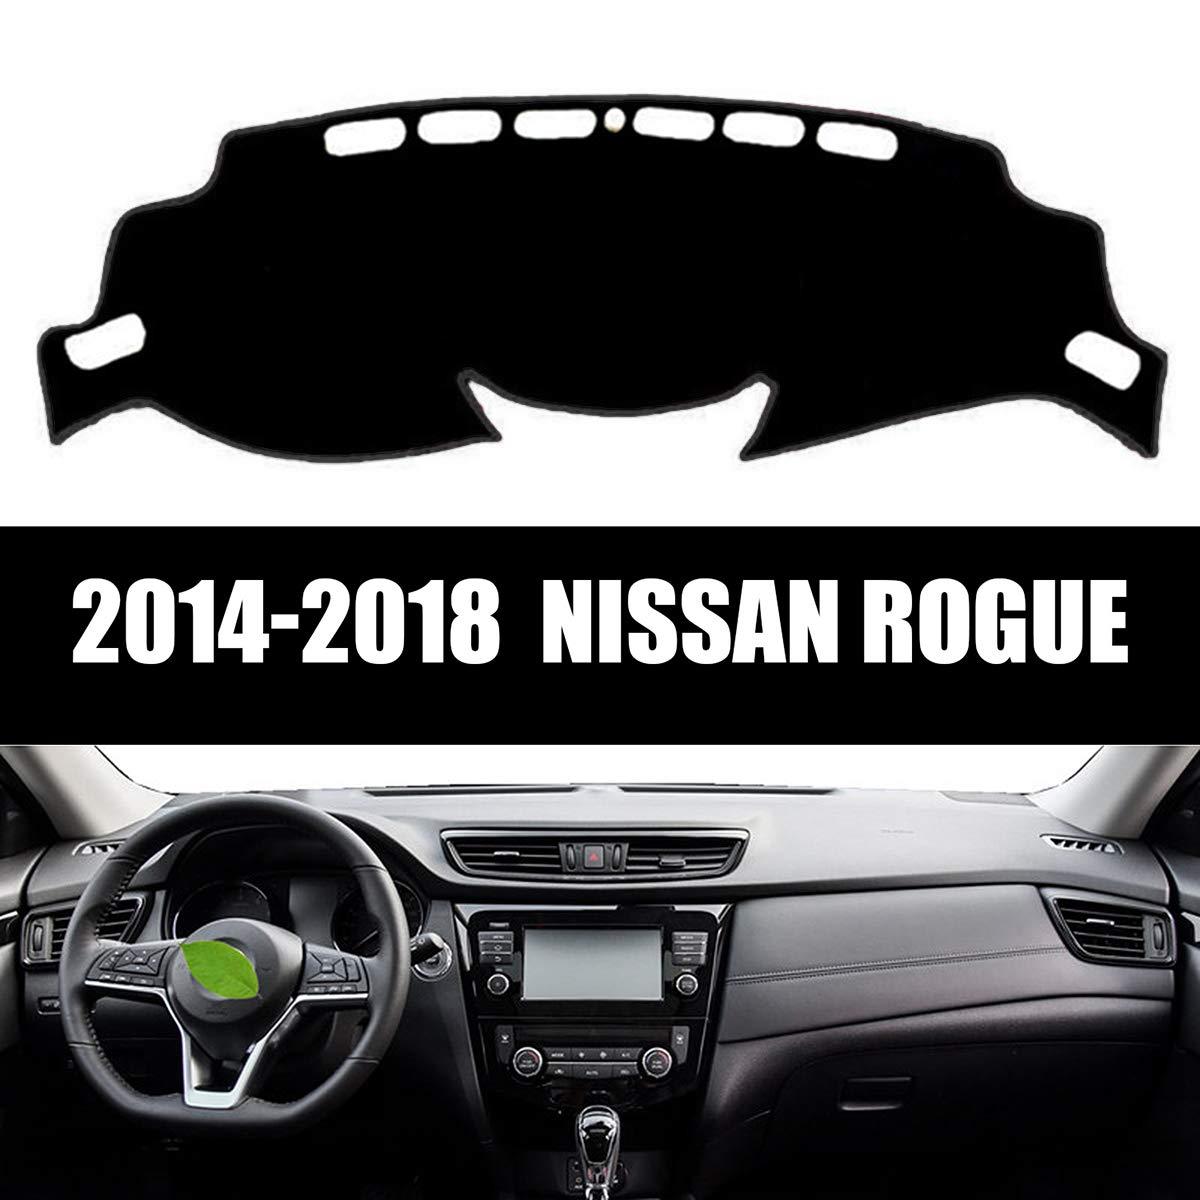 Yeeoy Anti-Slip Dash Board Car Mat Carpet Sun Shade Fits Nissan Rogue 2014-2018